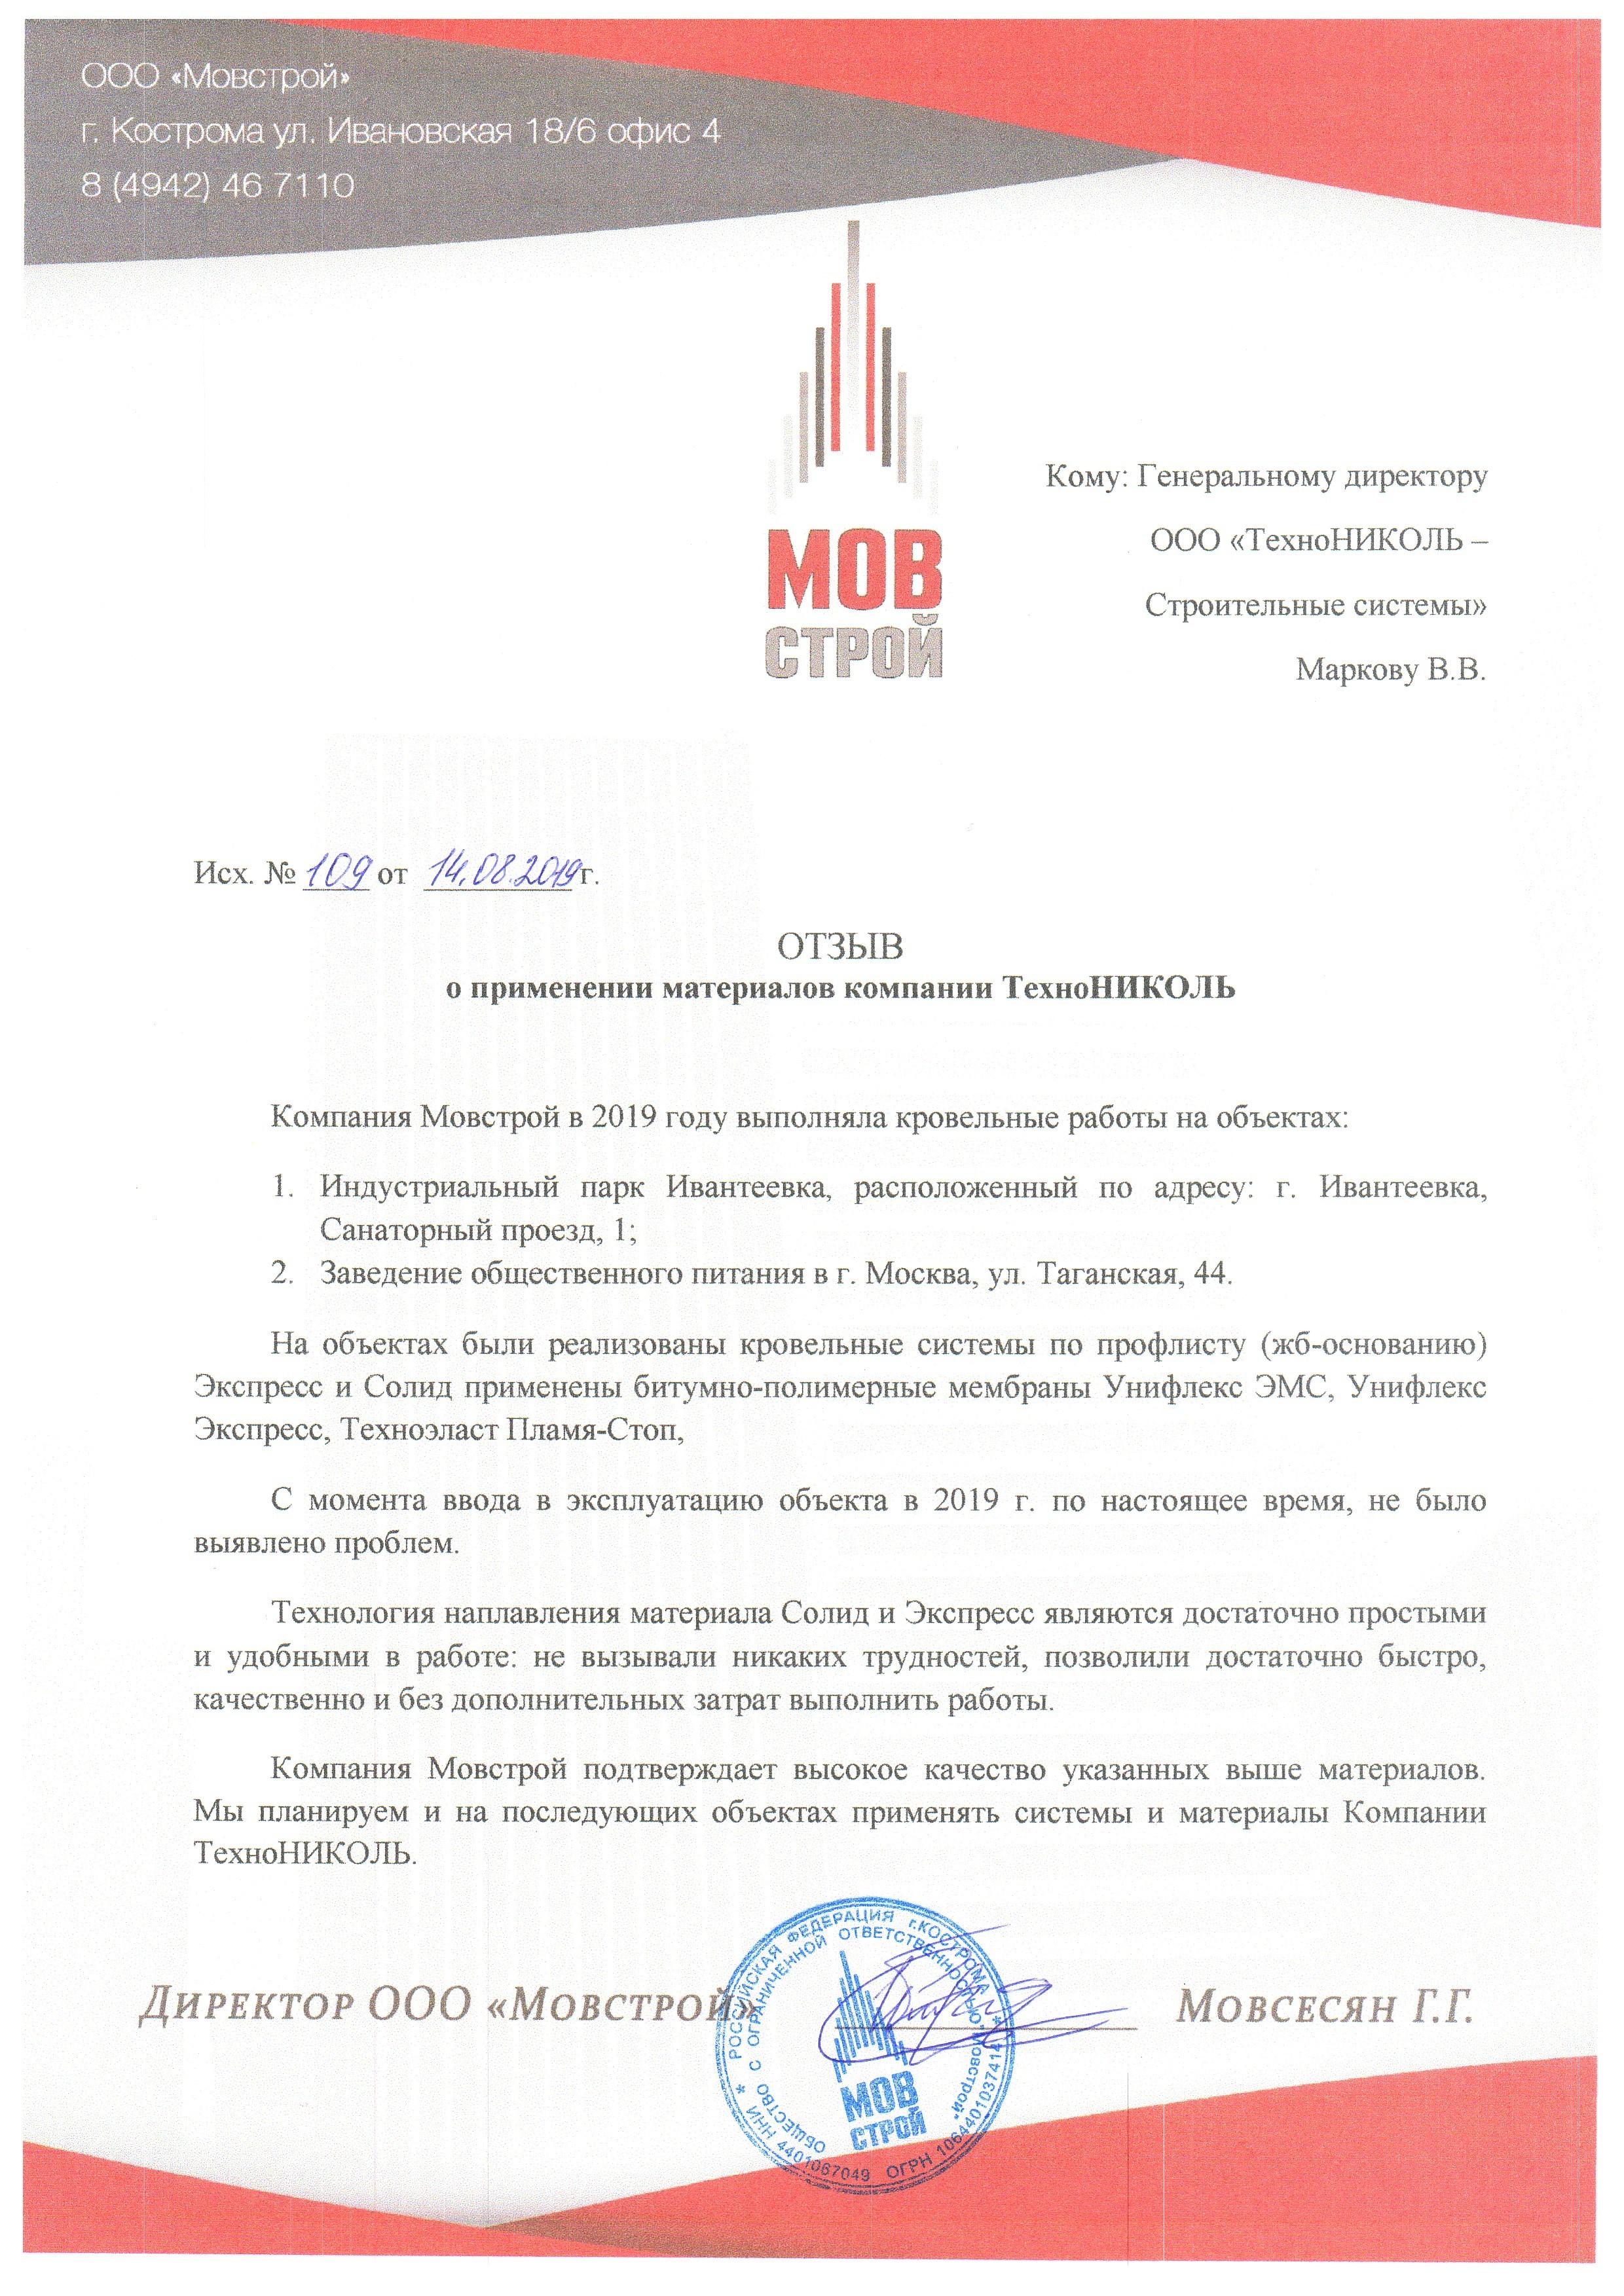 https://shop.tn.ru/media/other_documents/_2019__022450.jpg